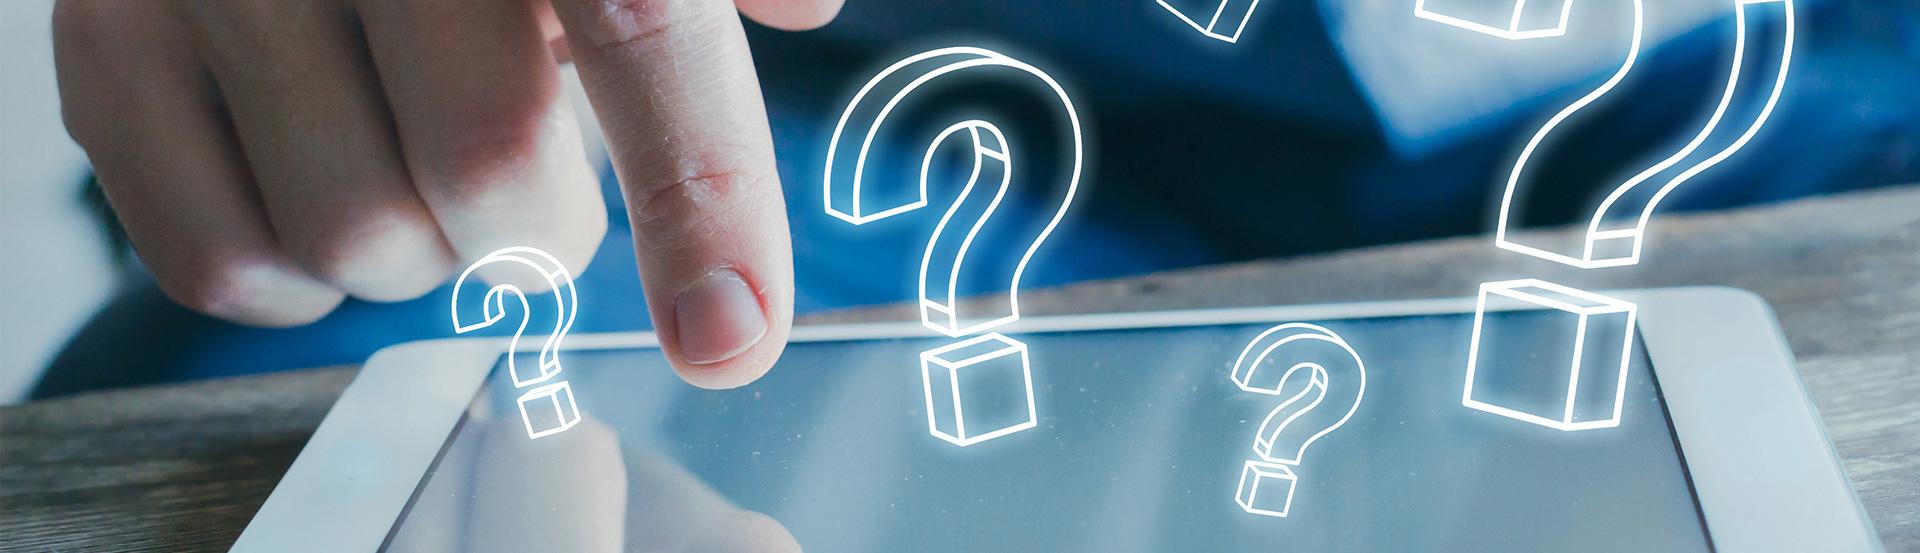 Enquêtes interes en ligne RH, formation, communication, DSI, SIRH